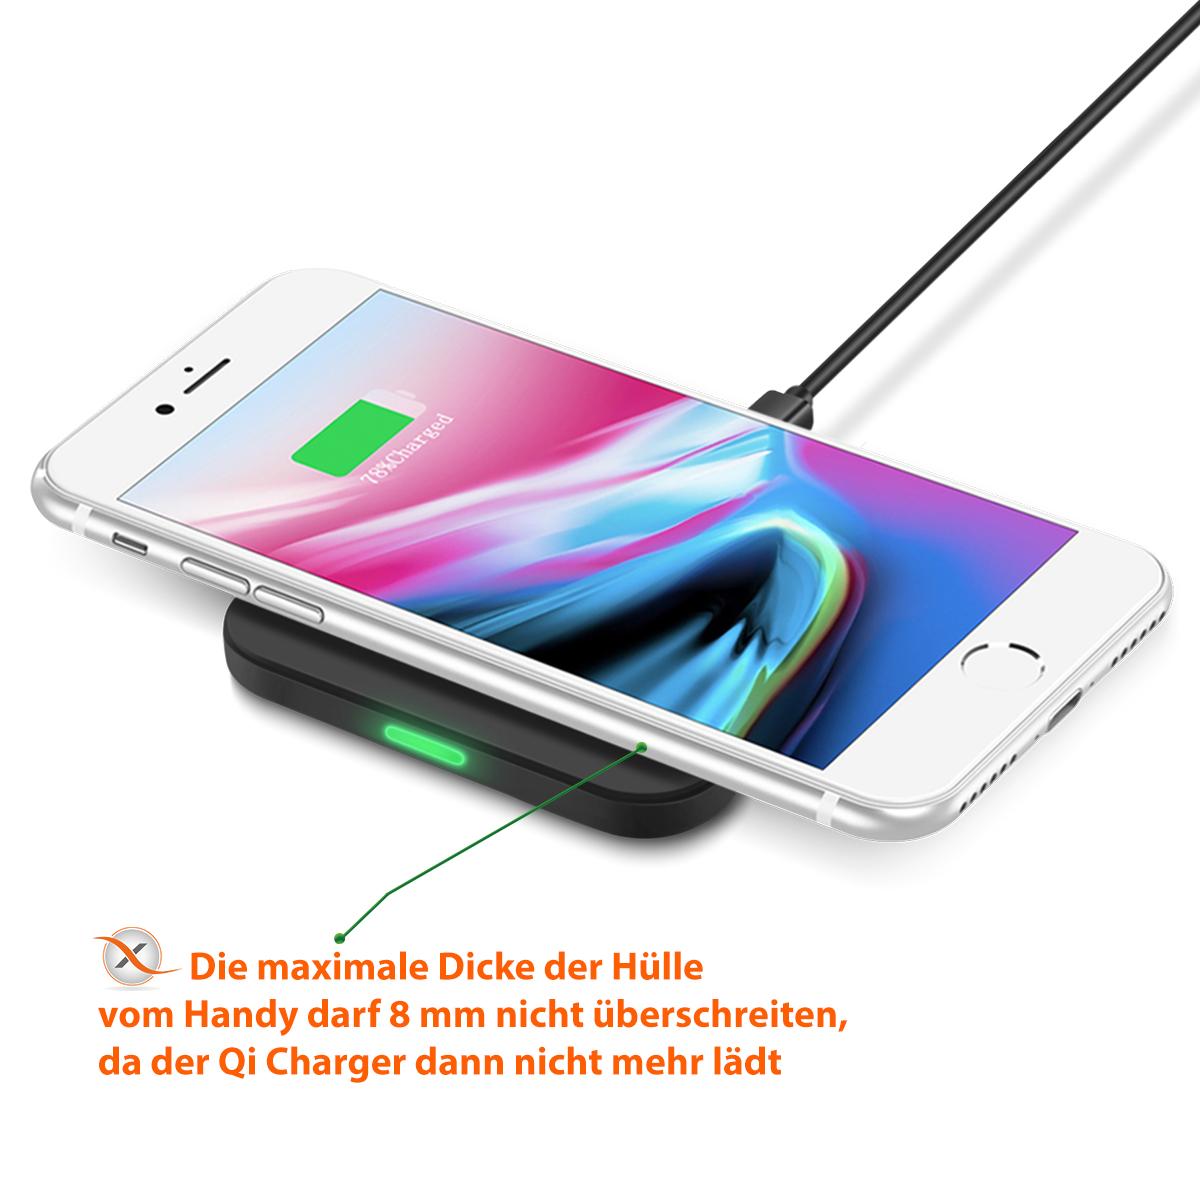 qi wireless ladestation apple iphone xs max kabellos induktives schnellladeger t technik kfz. Black Bedroom Furniture Sets. Home Design Ideas